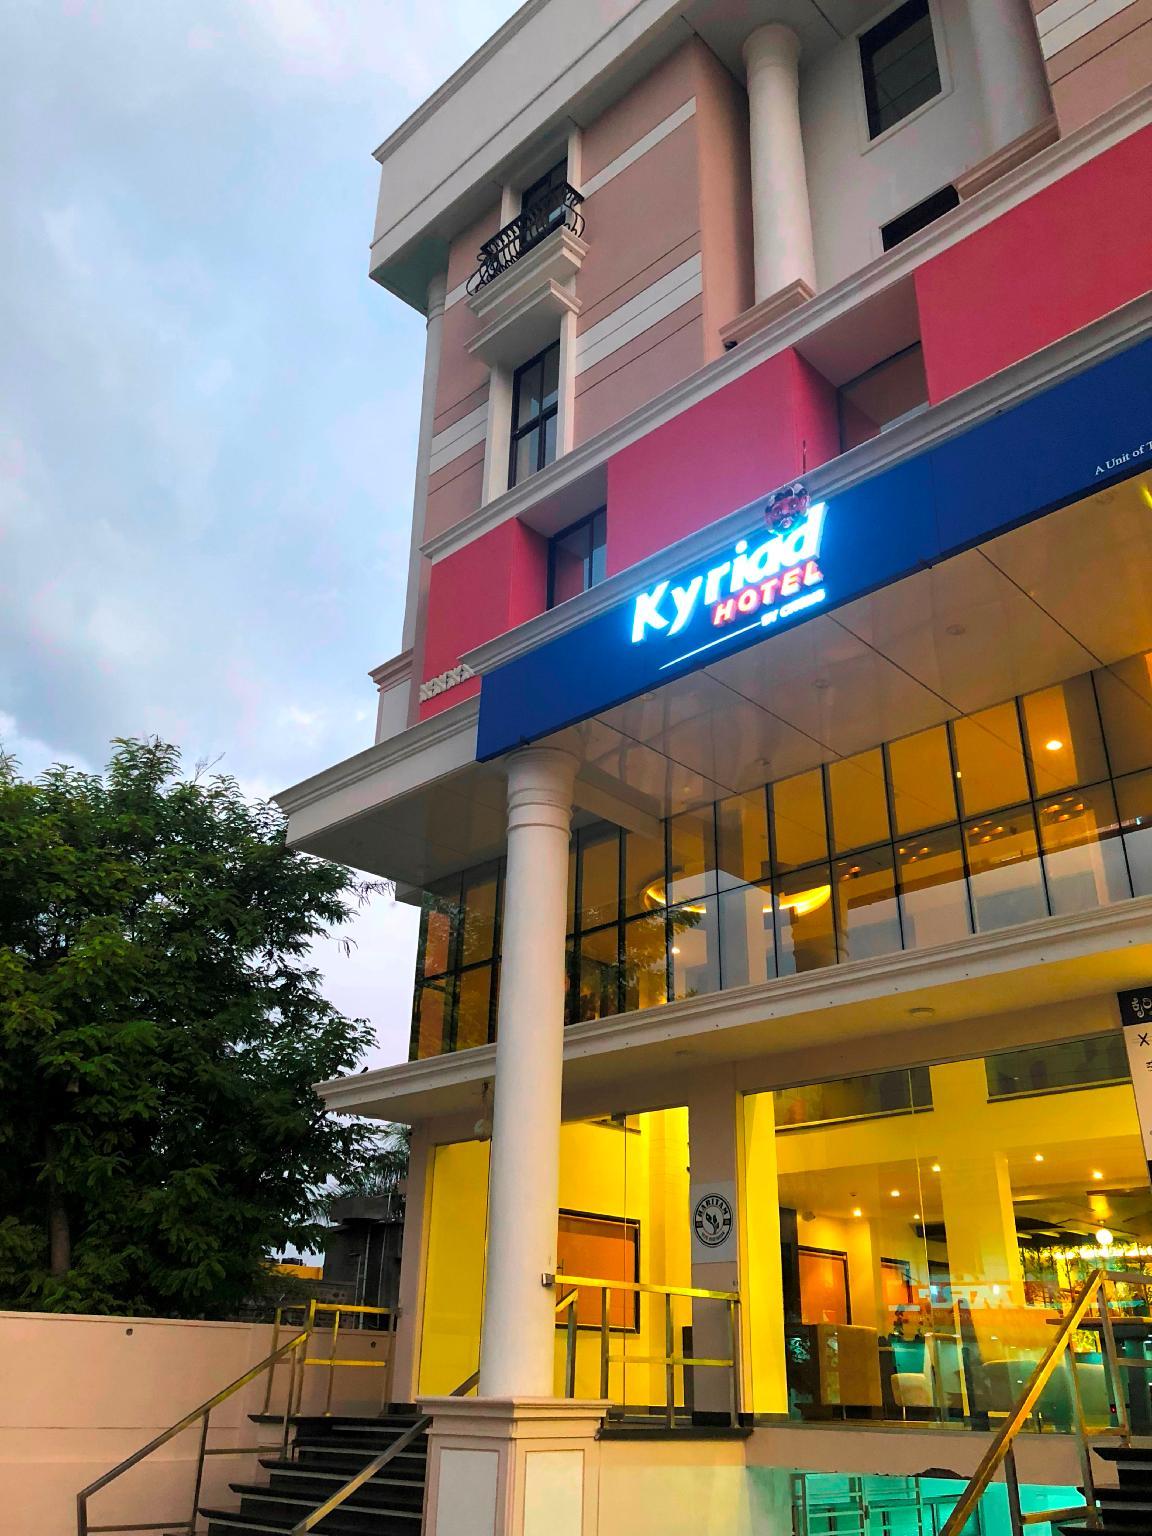 Mid-Range Hotel in Bijapur-Kyriad Hotel Vijayapura by OTHPL